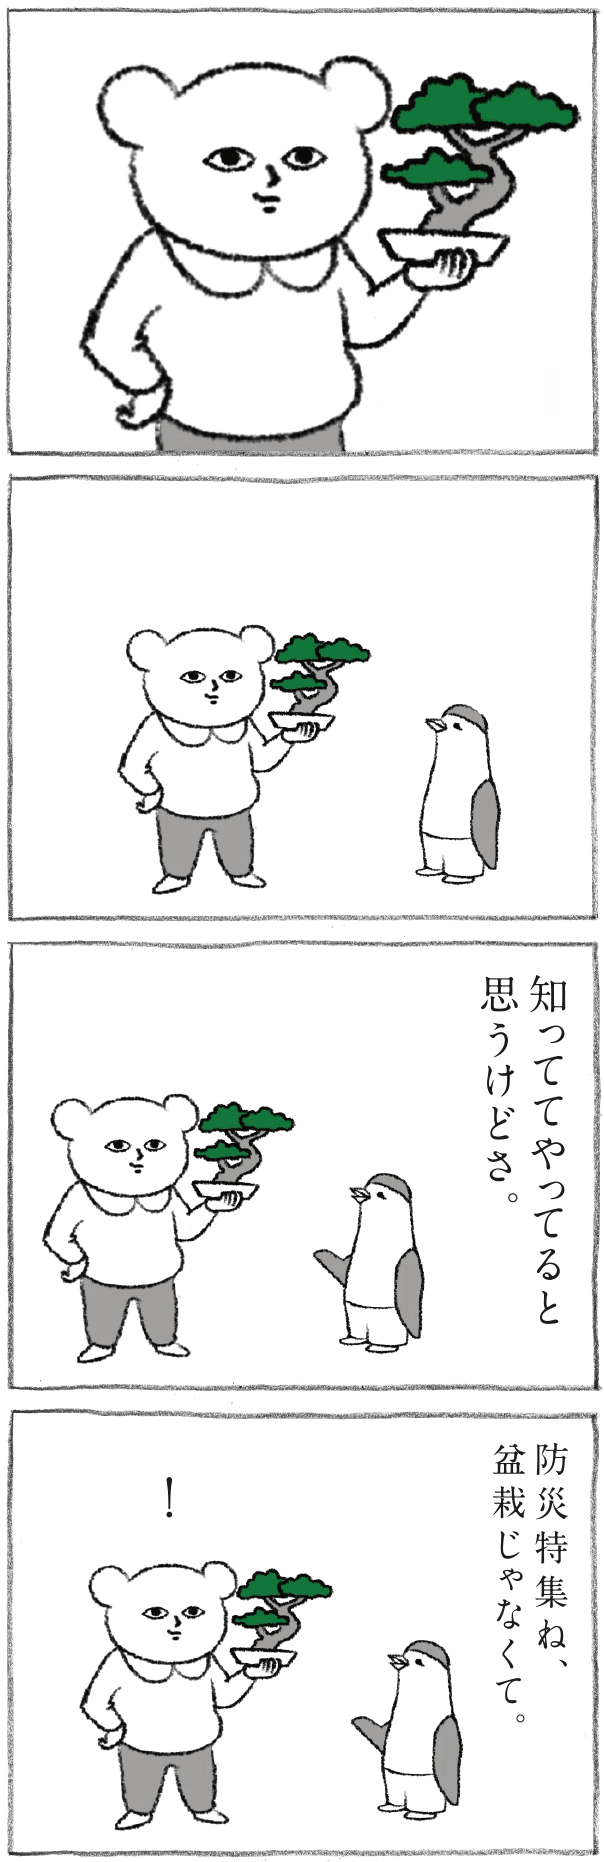 Hanako 1193号:おかわり自由